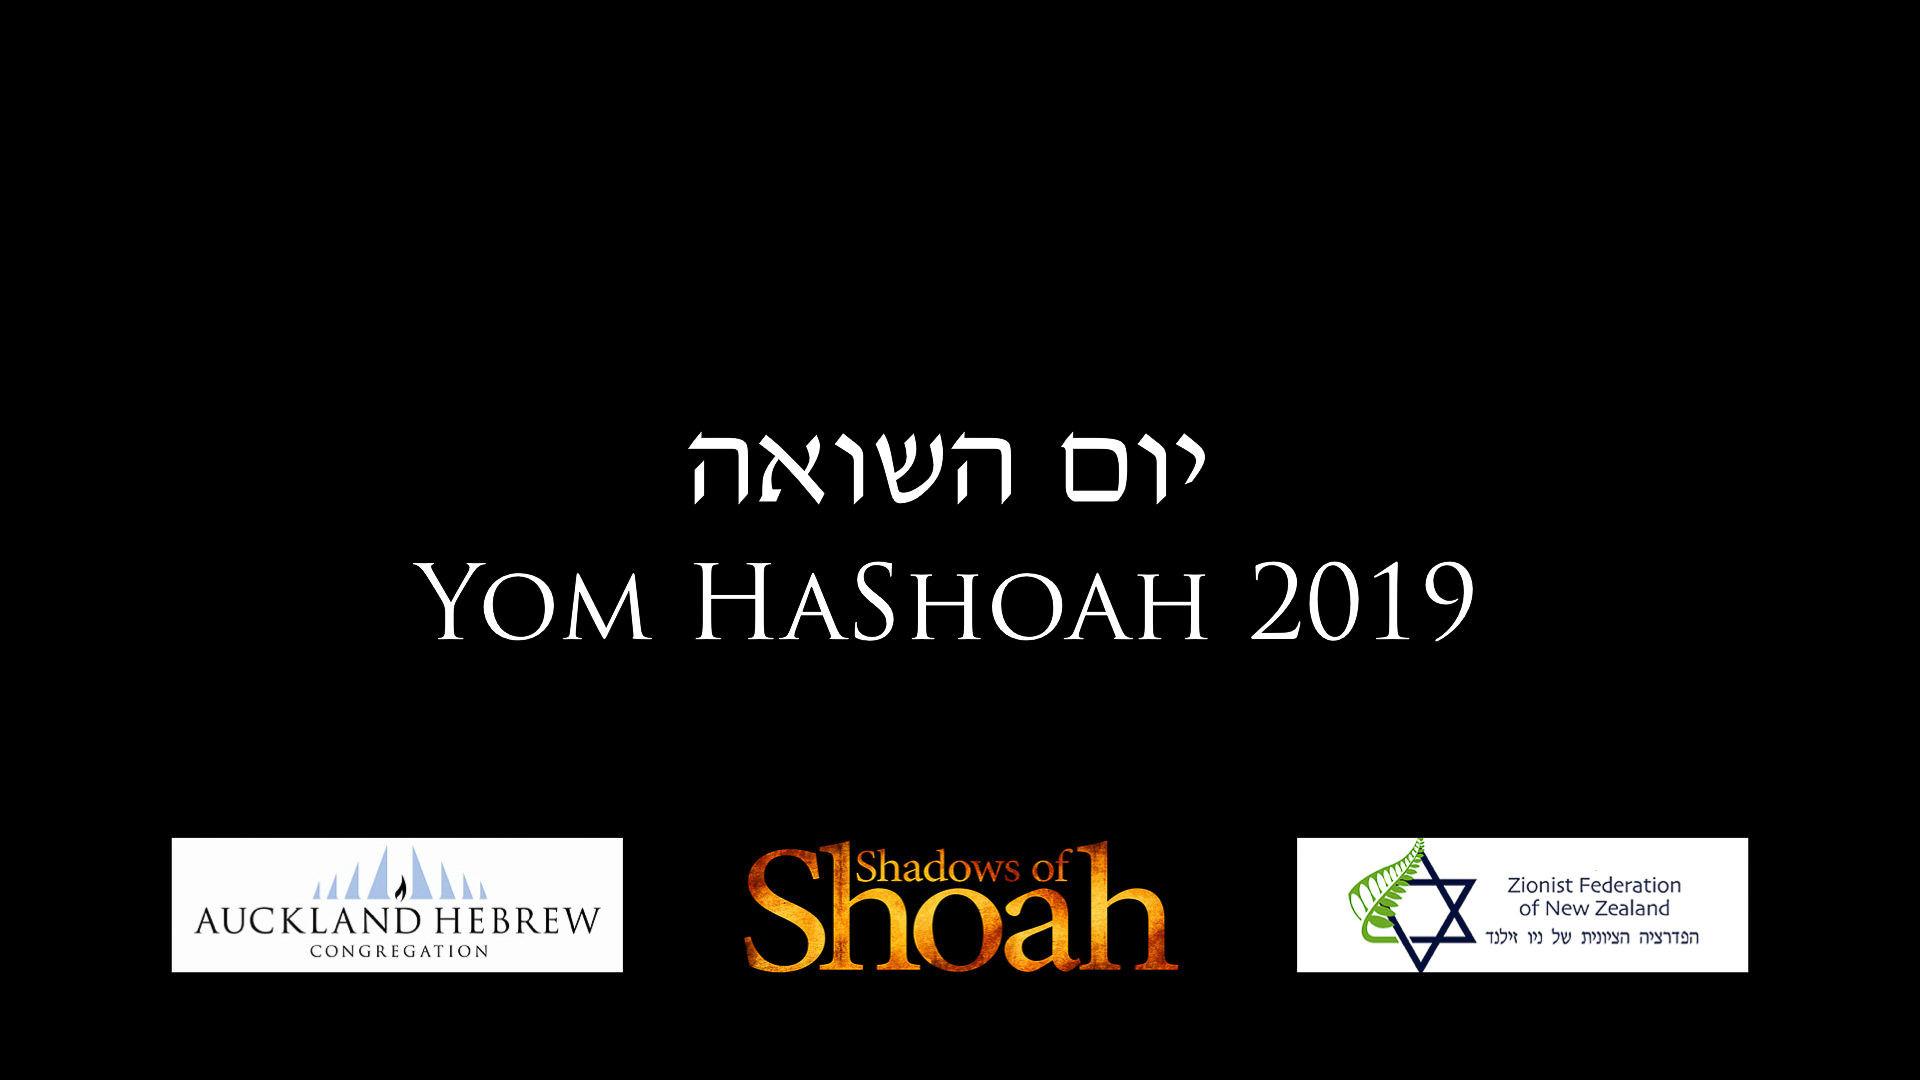 1Yom HaShoah Names 2019.jpg